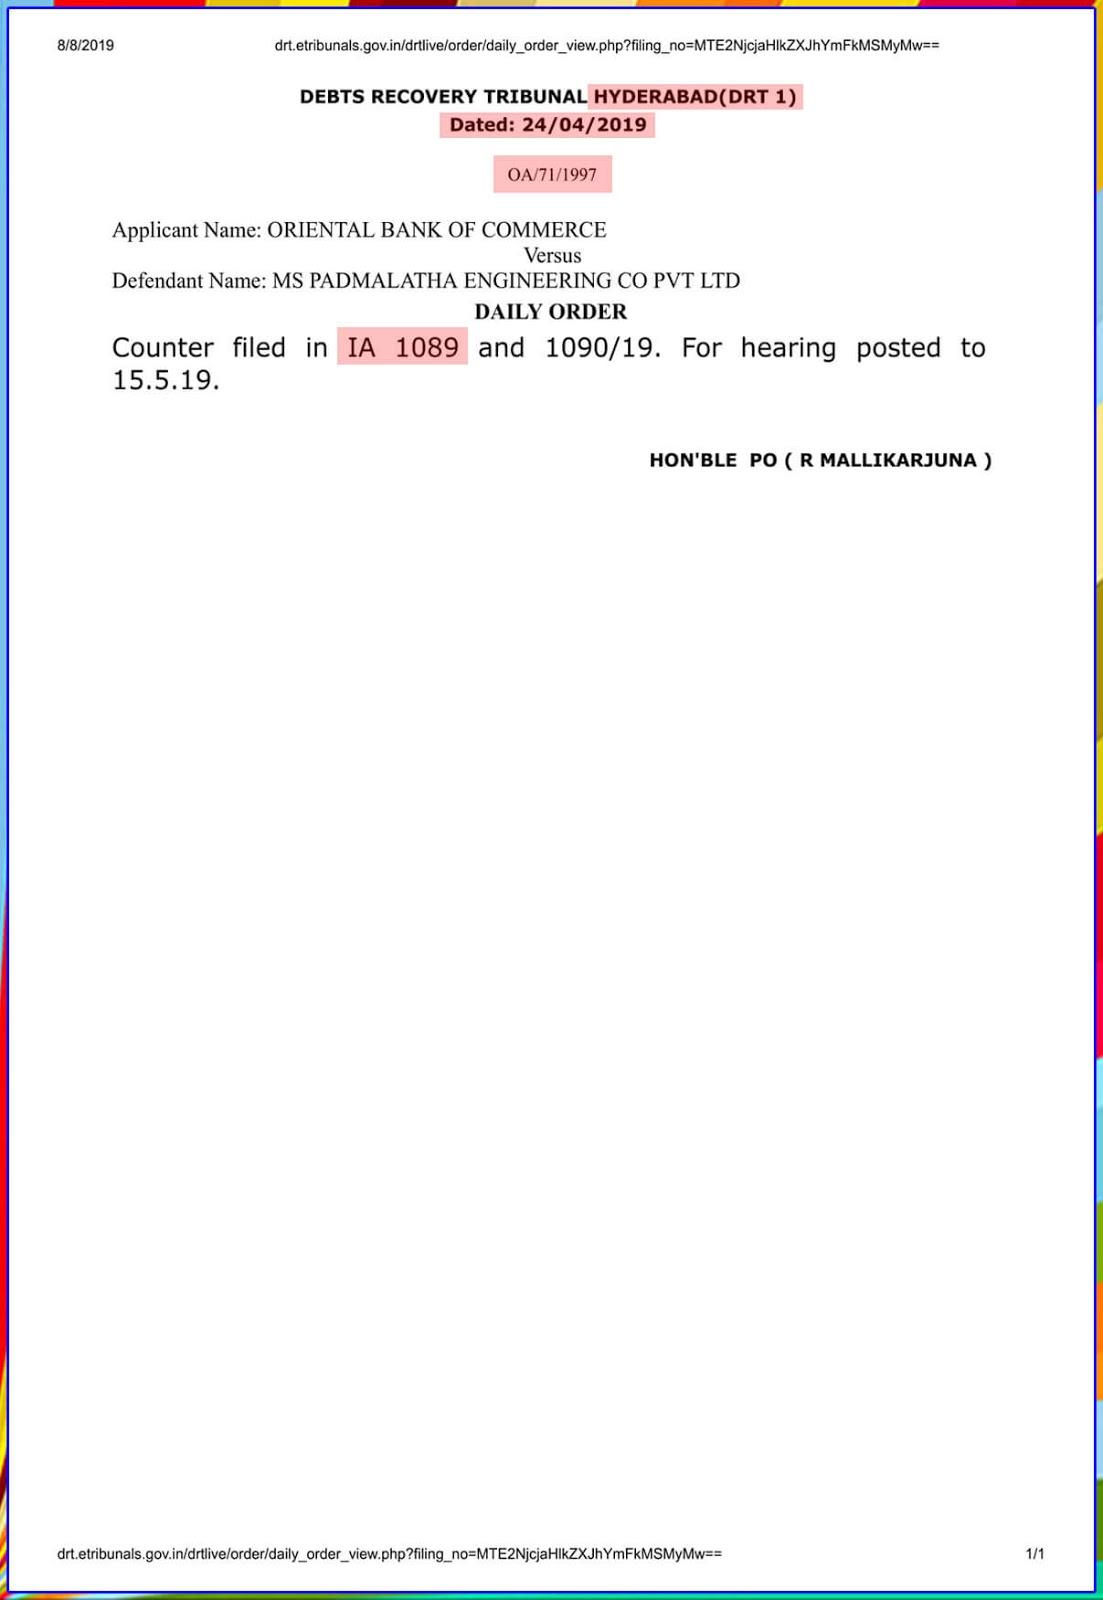 Debit recovery Tribunal-2 Hyderabad-I.A.No.1089/2019-12